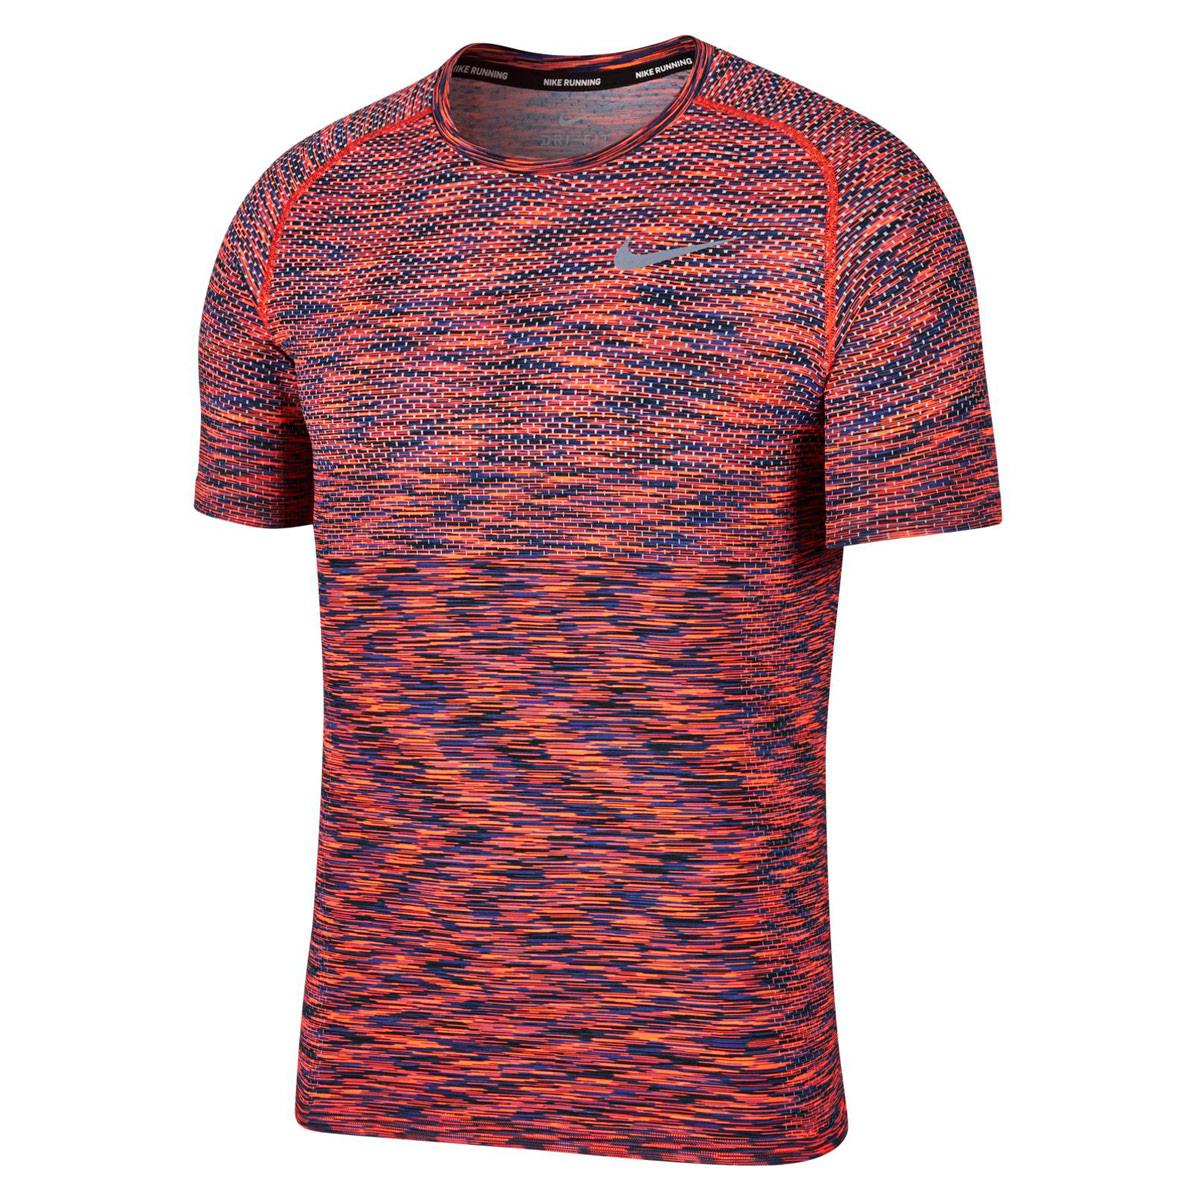 Top Hombre Dri Para Nike Knit Running Rojo Fit Camisetas De vmOnN80w